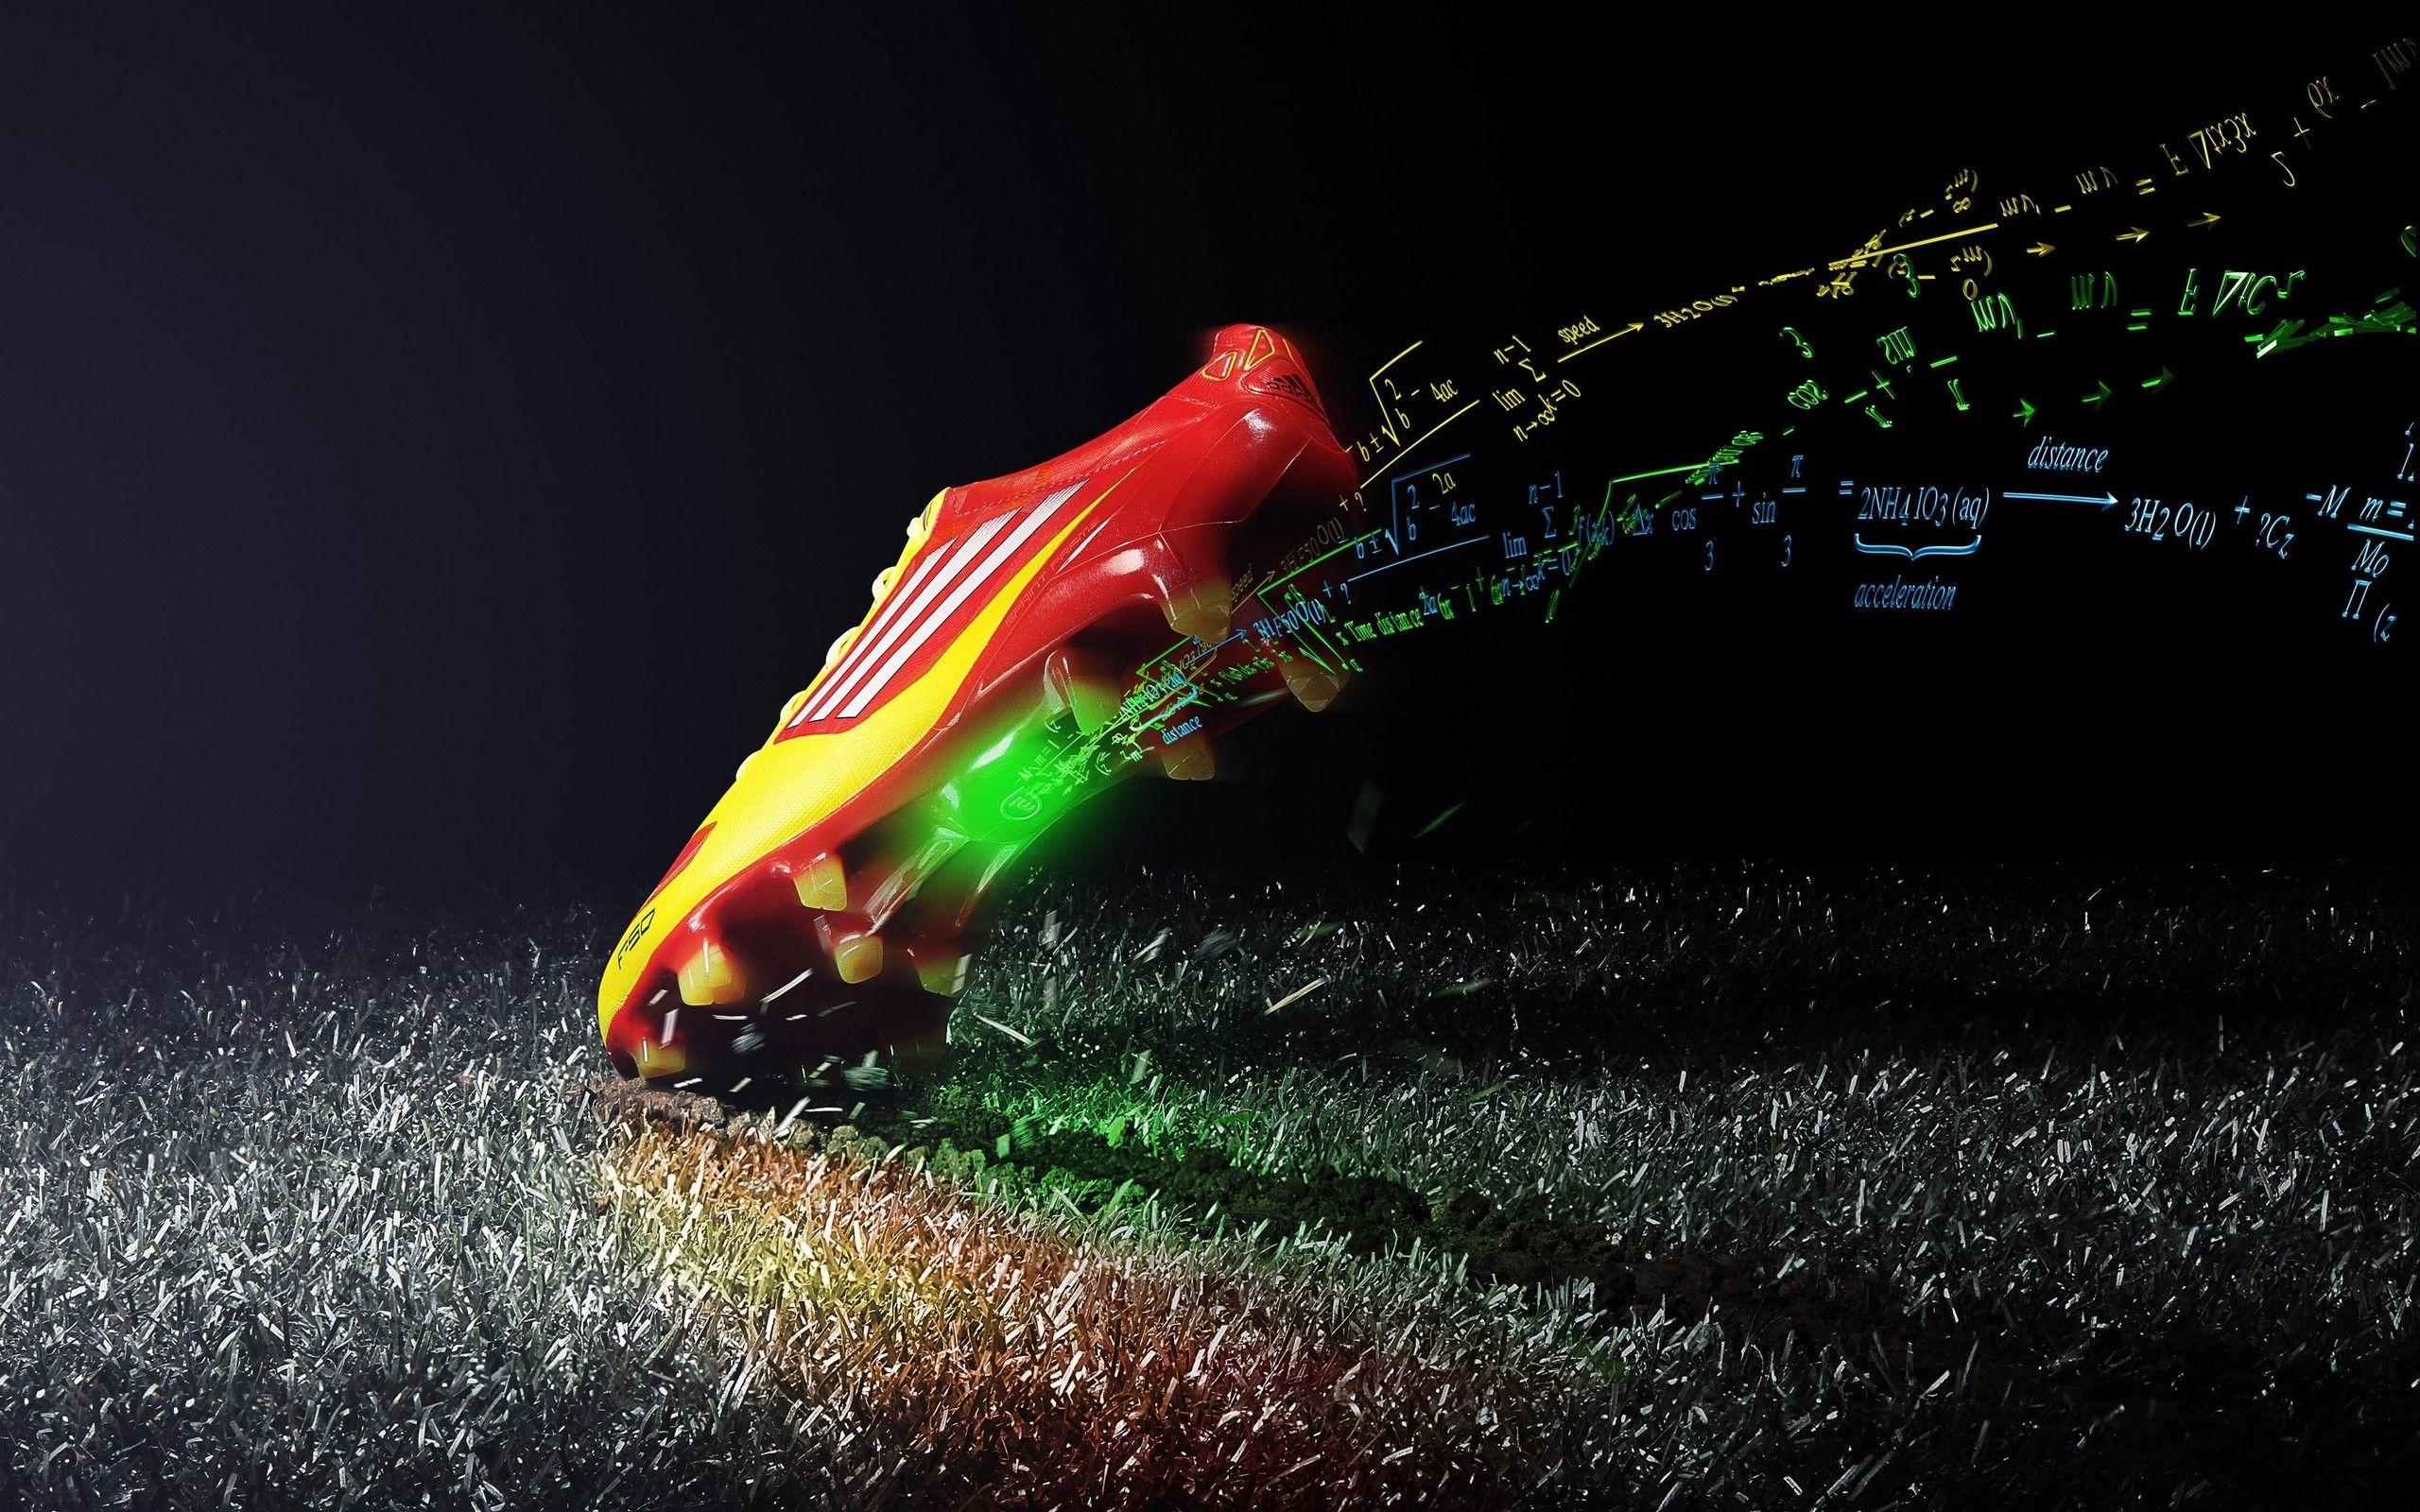 17c2f035122ec Cool Football Shoe Abstract HD Wallpaper Futebol